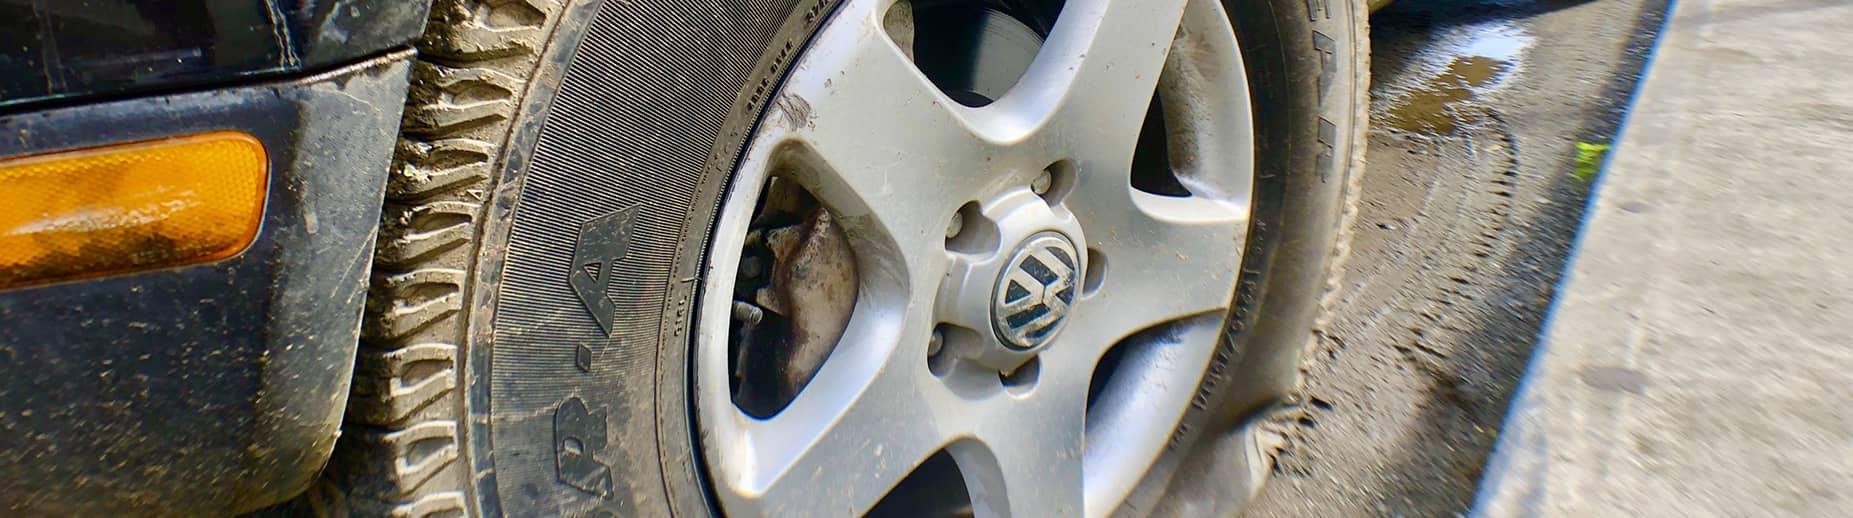 Port Elgin Auto Repair, Car Repair and Auto Mechanic